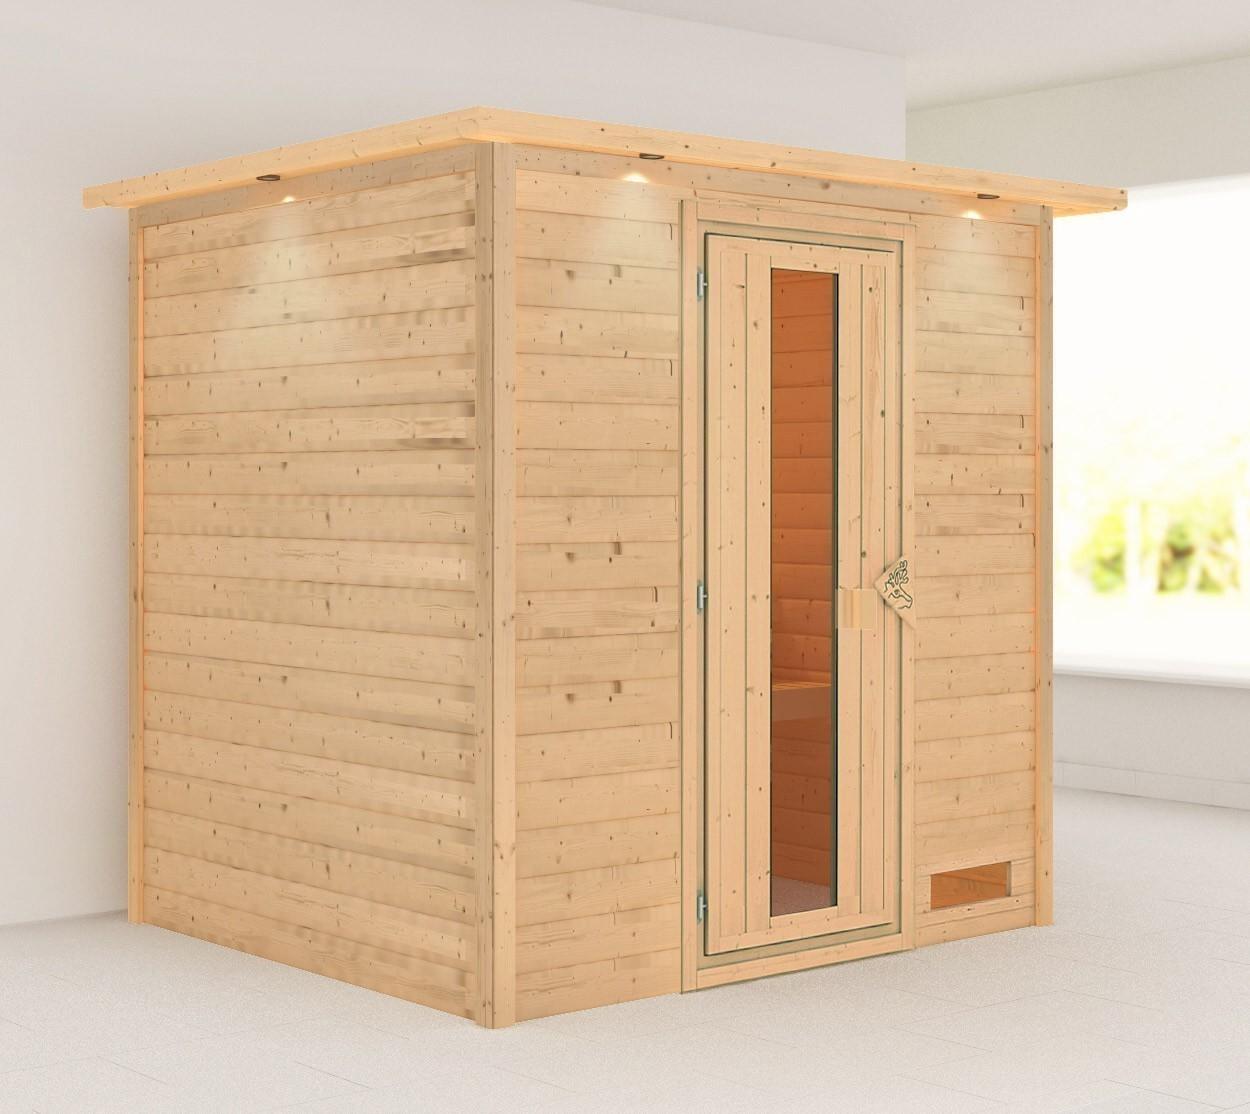 Woodfeeling Sauna Anja 38mm Dachkranz ohne Ofen Holztür Bild 1